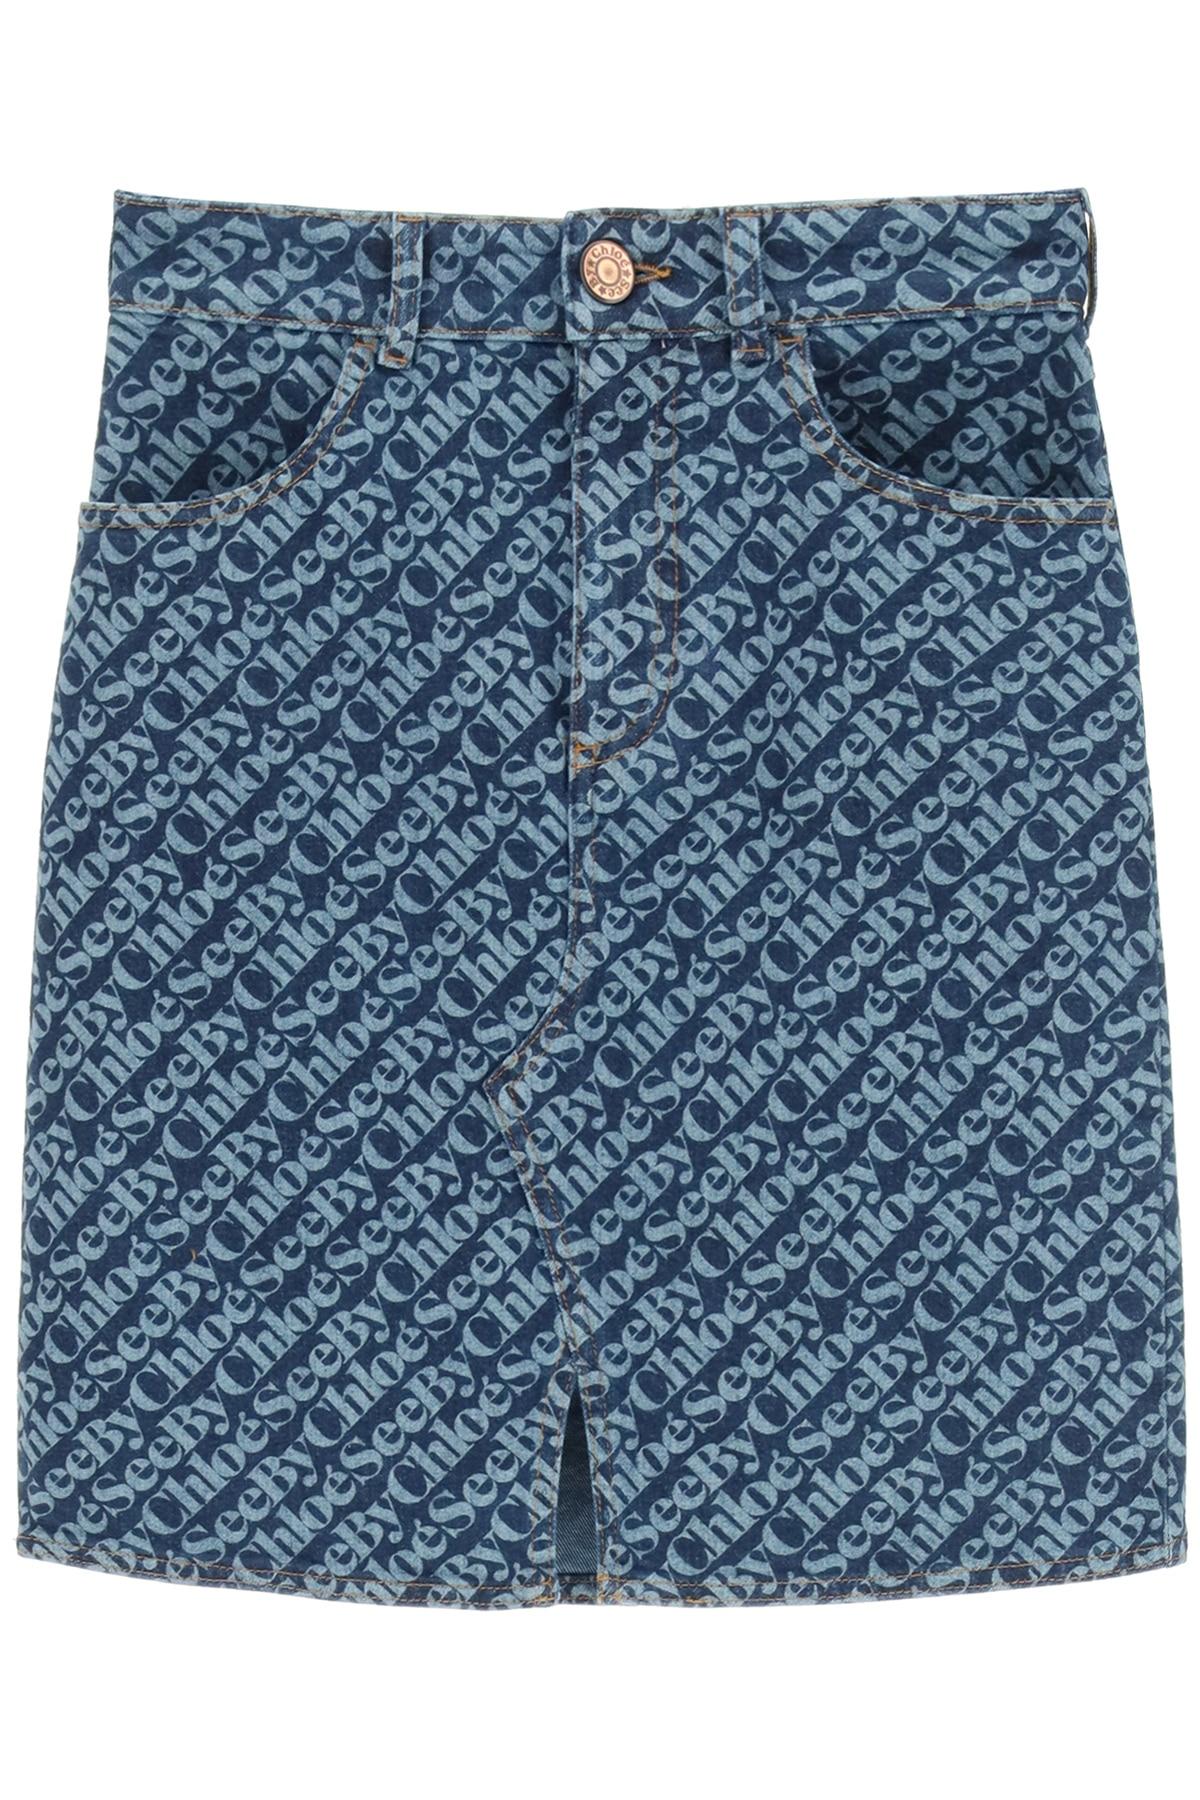 SEE BY CHLOE MONOGRAM DENIM MINI SKIRT 36 Blue Cotton, Denim